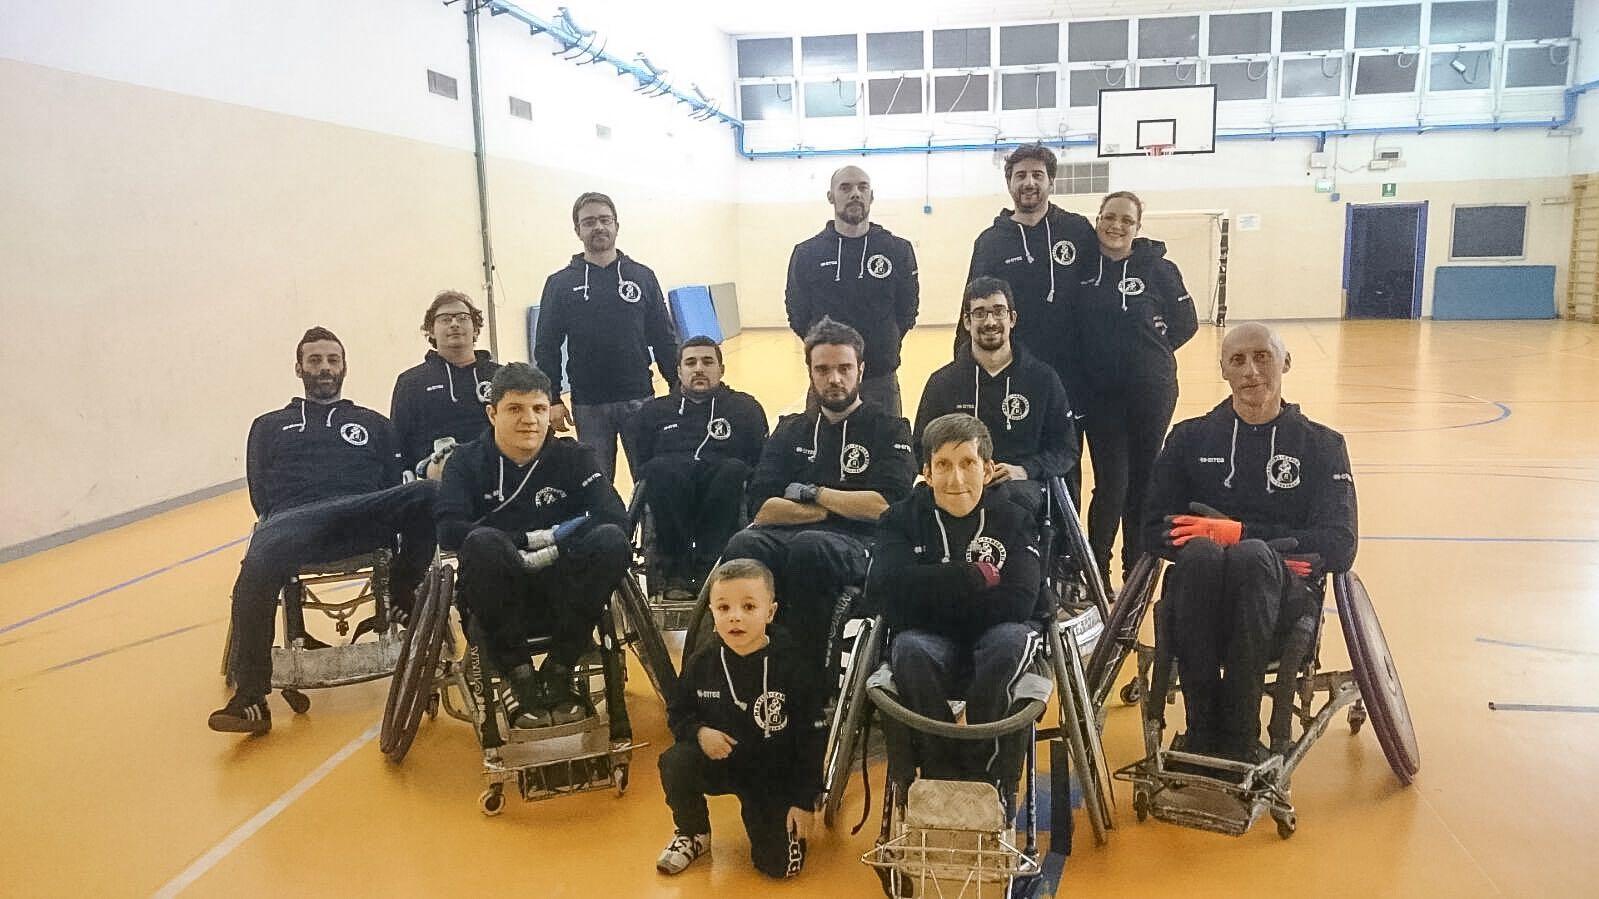 Mastini Cangrandi Verona - La squadra